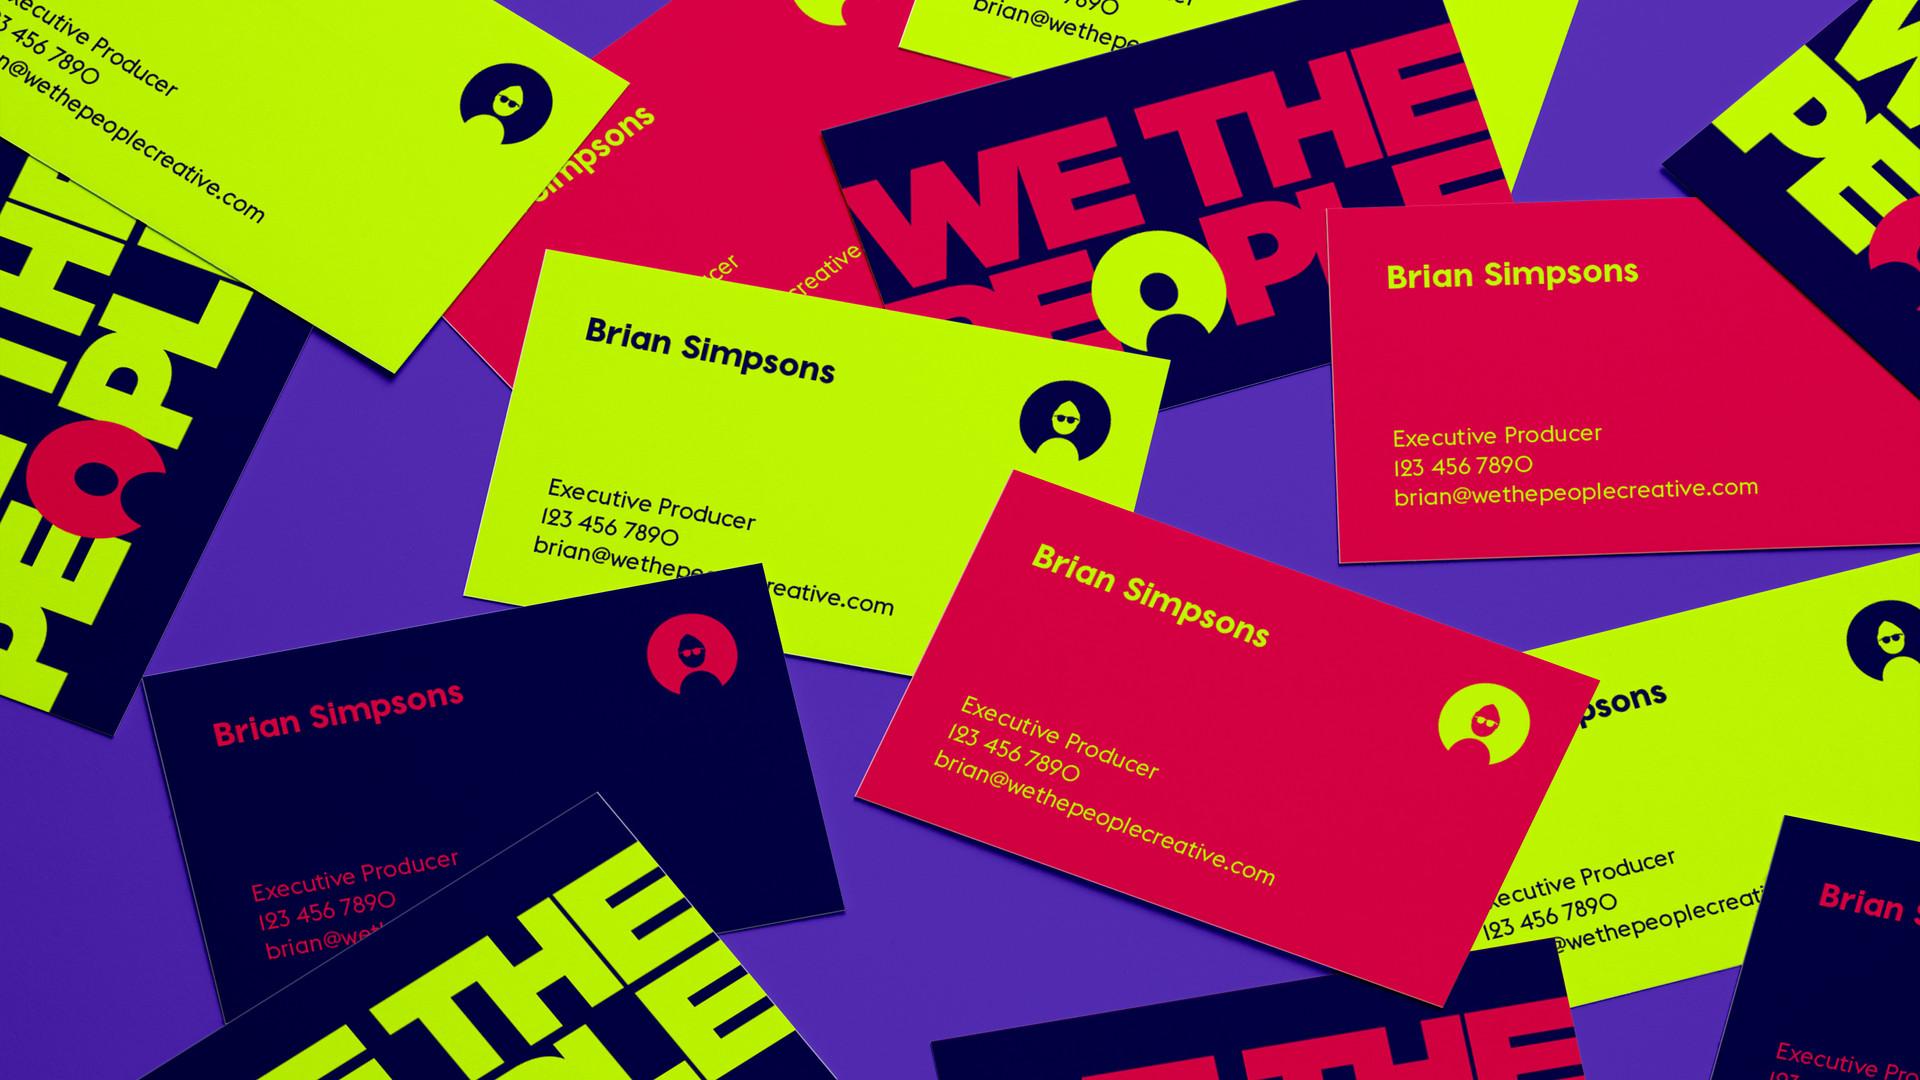 TWP Business Card Mockup copy.jpg